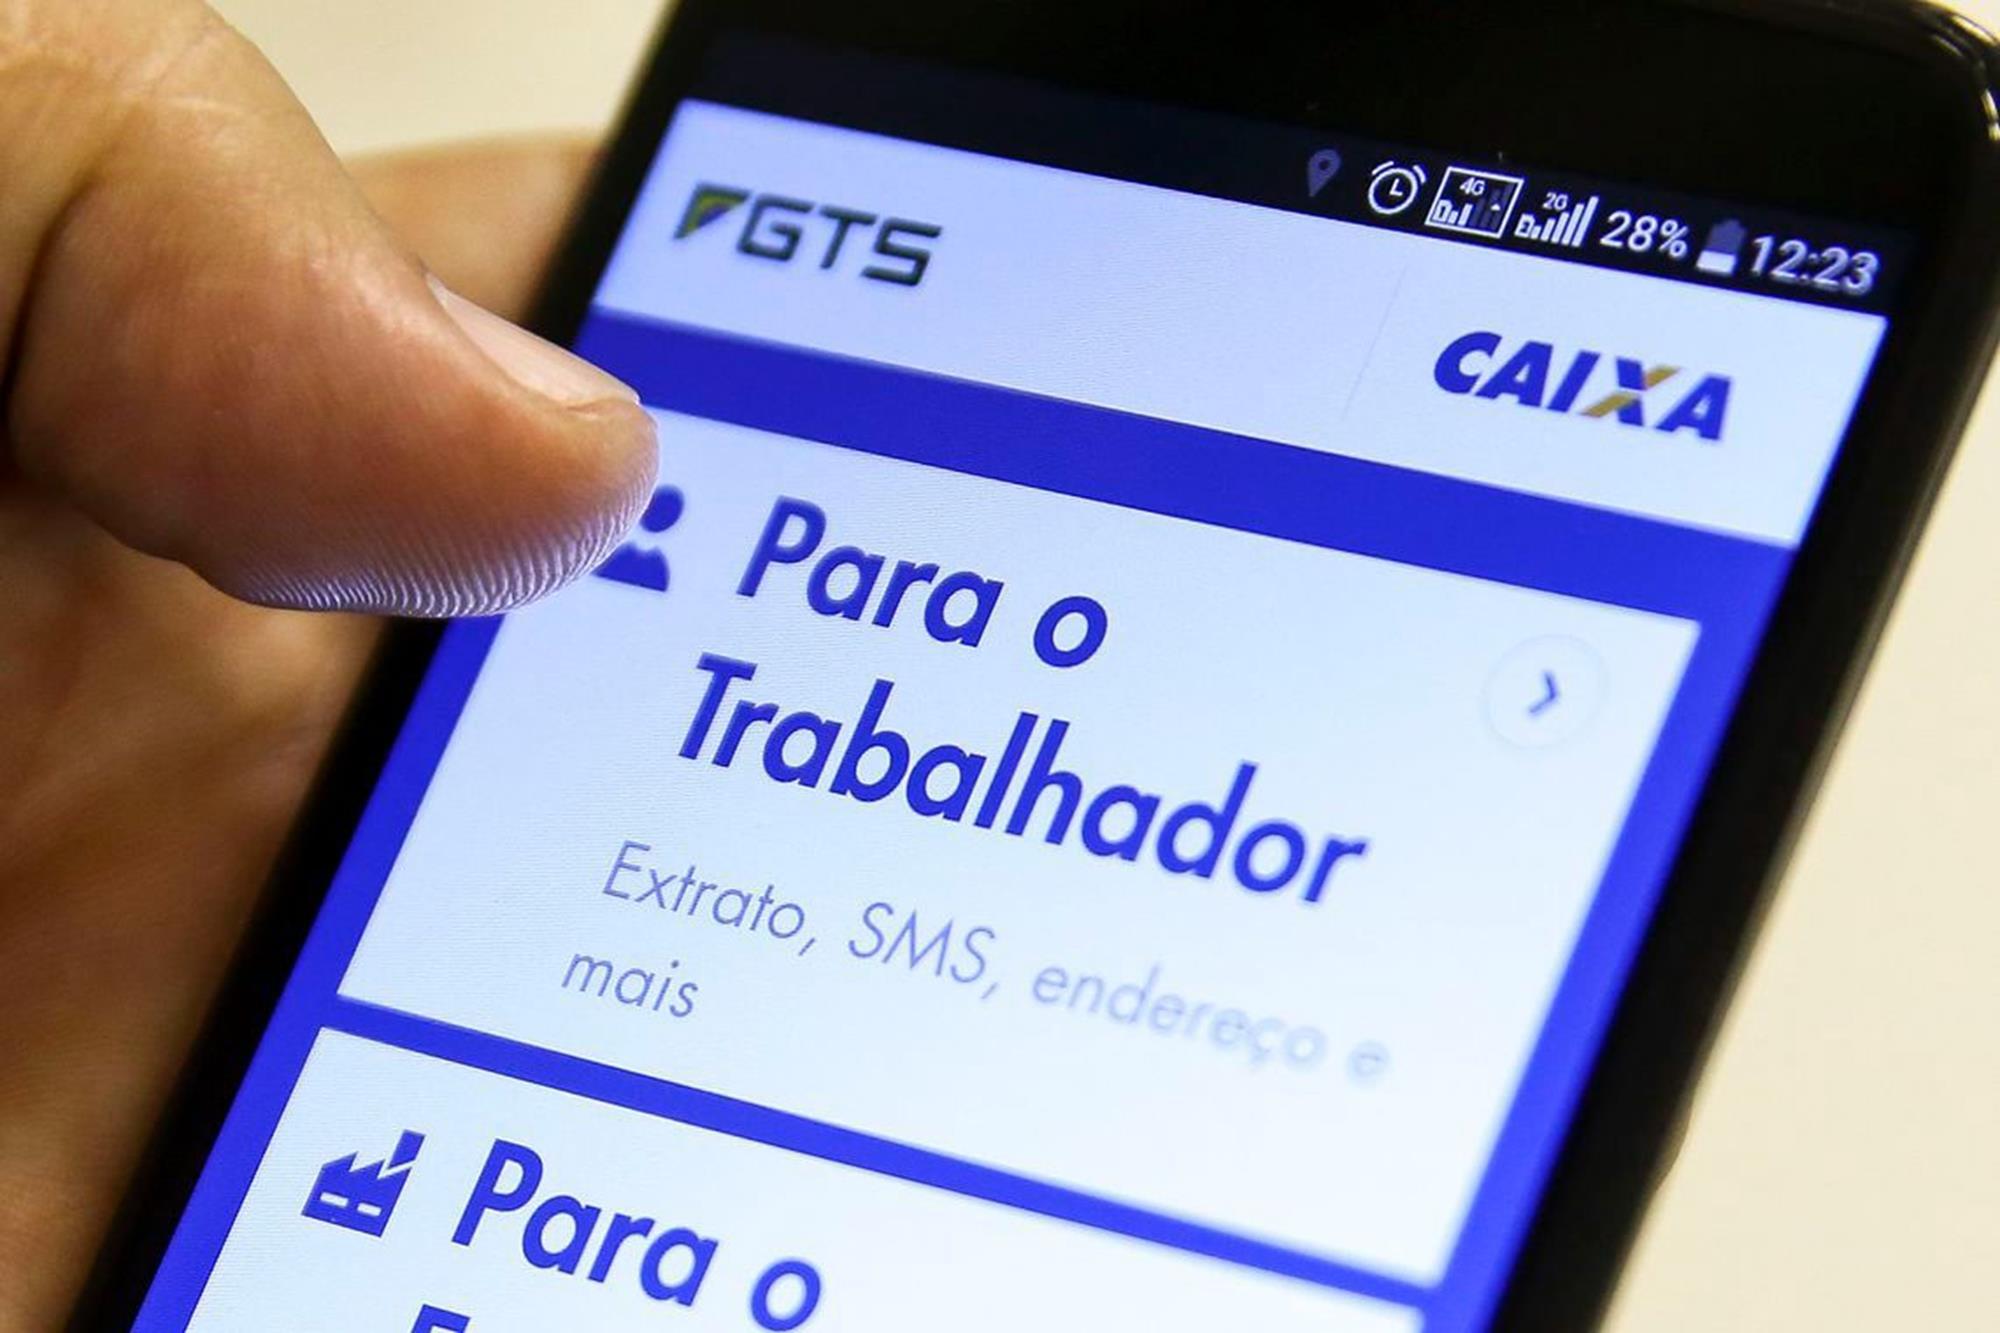 extrato FGTS, FGTS, saldo FGTS, direitos trabalhador, Marcelo Camargo/Agência Brasil